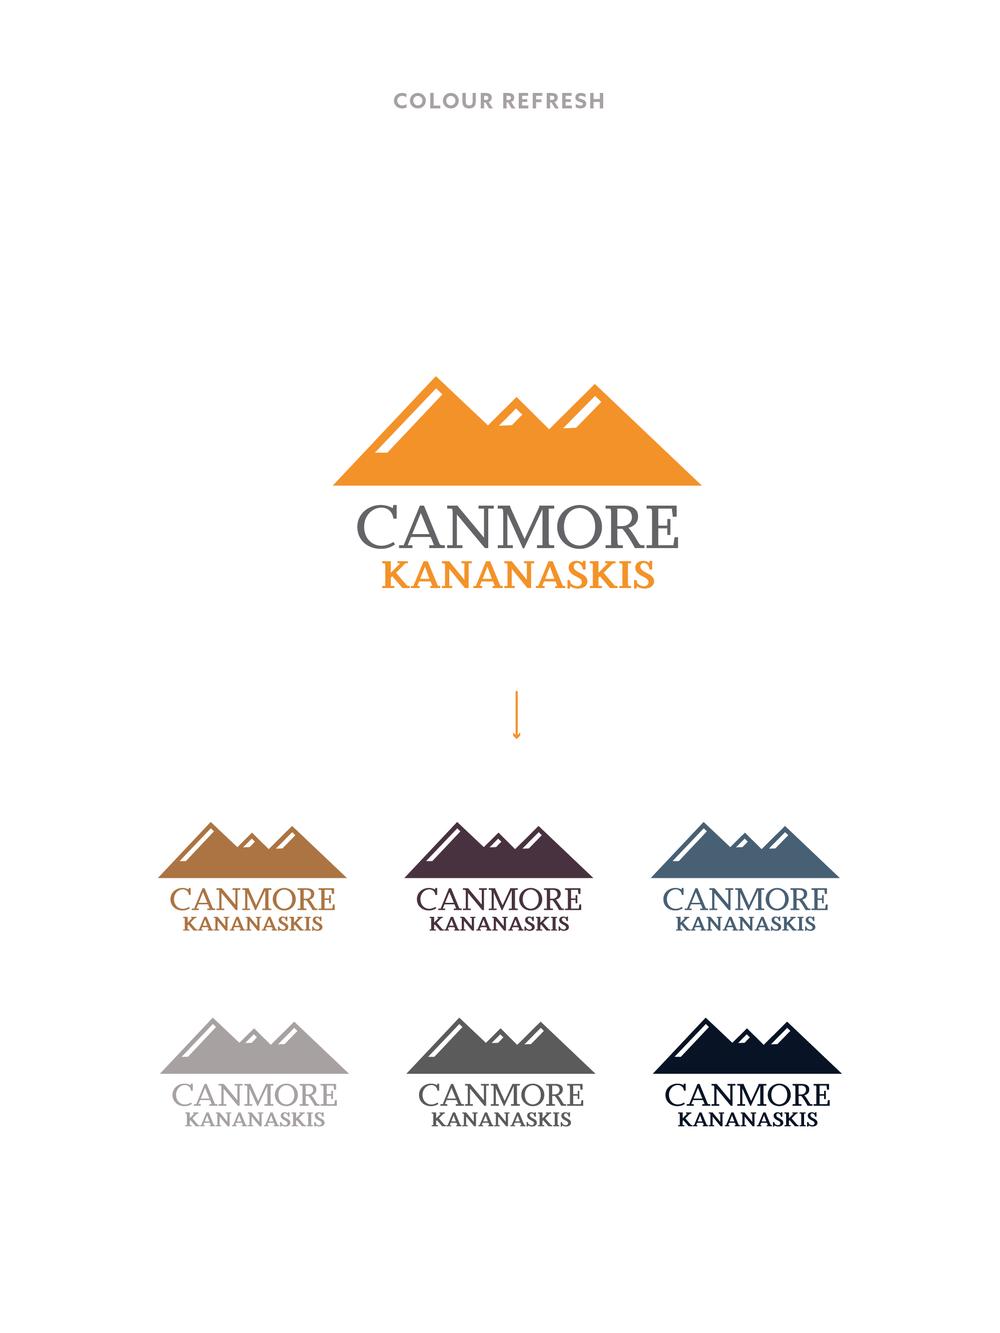 Tourism Canmore Kananaskis Logo | Trout + Taylor www.troutandtaylor.com